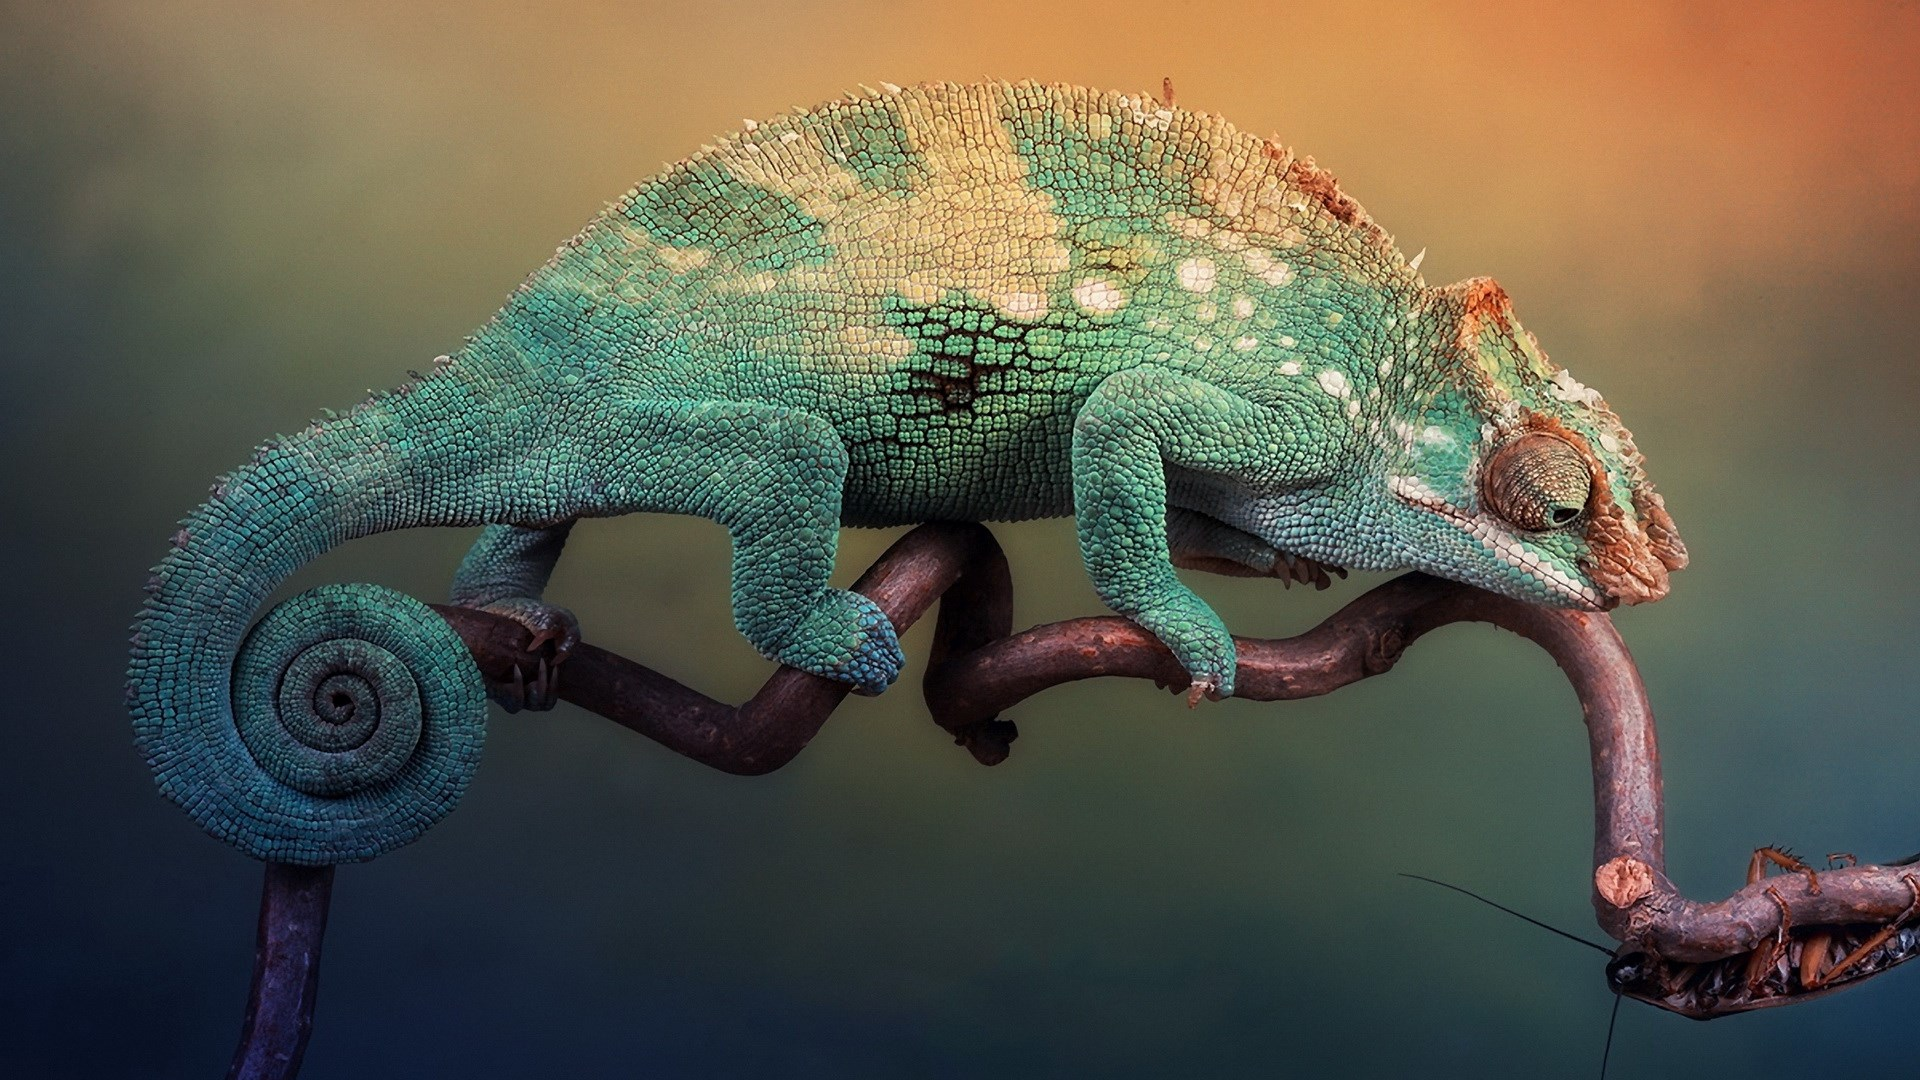 chameleon wallpapers  top free chameleon backgrounds